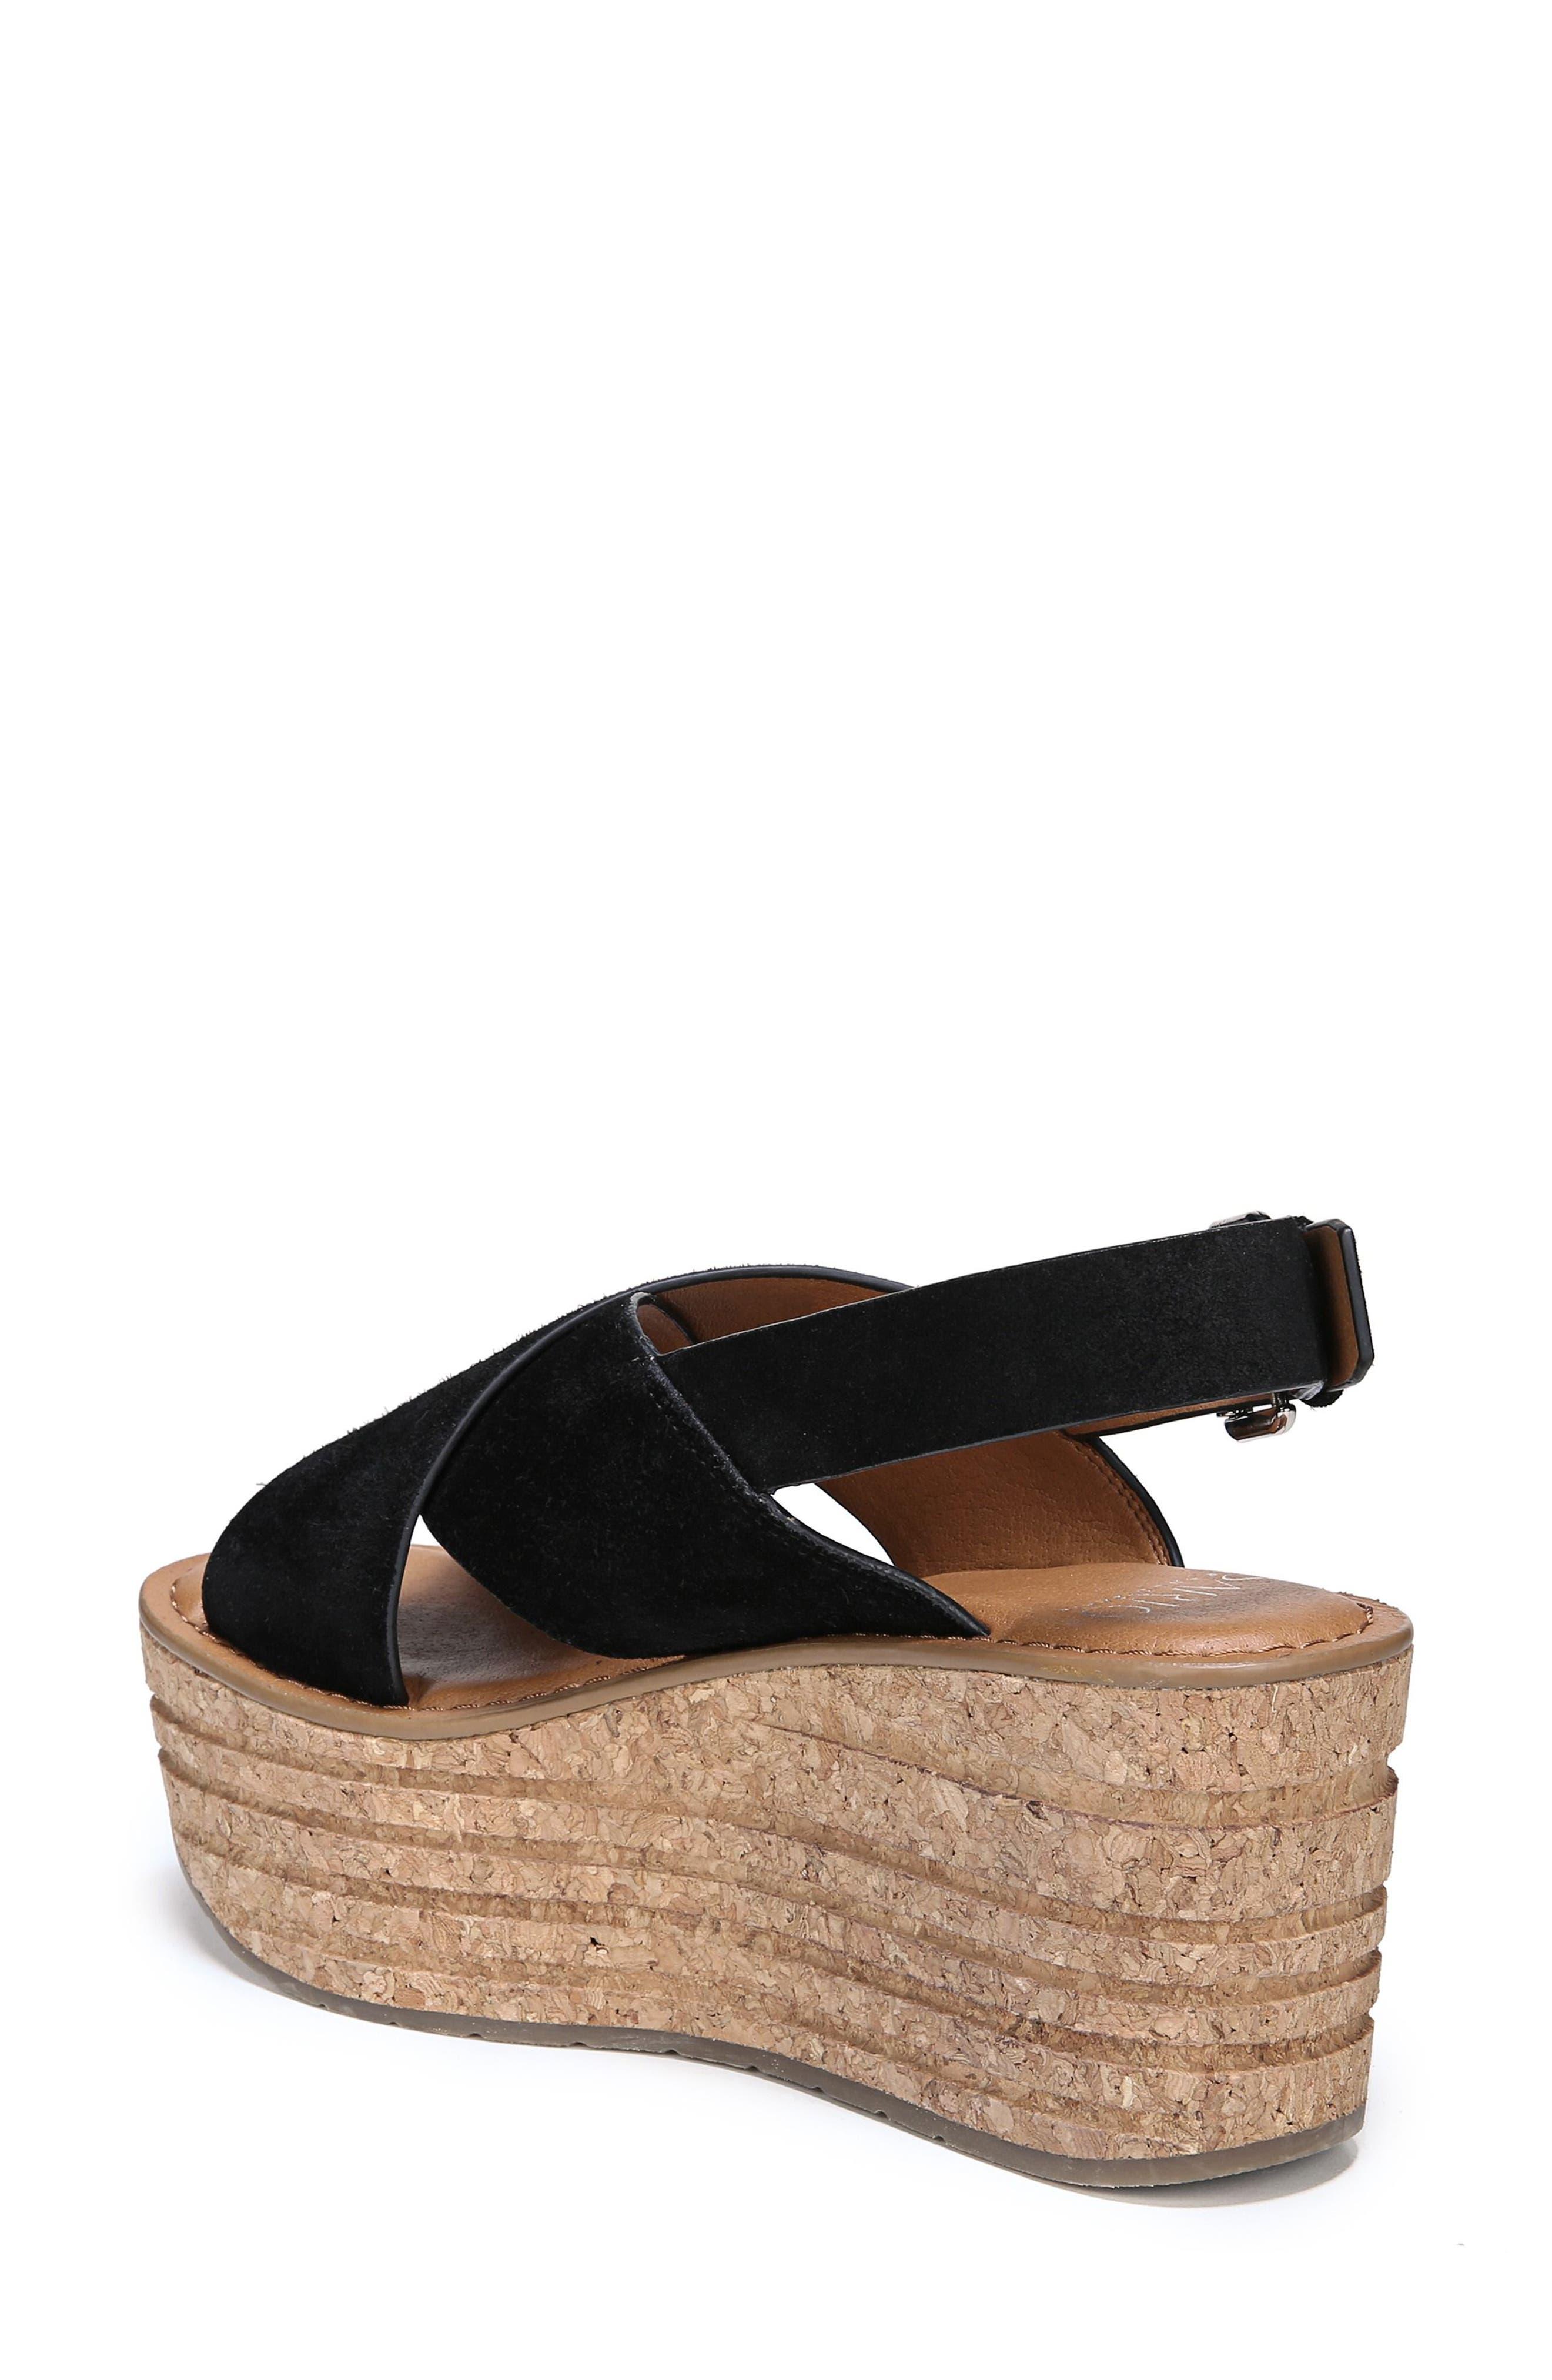 Caroline Platform Wedge Sandal,                             Alternate thumbnail 7, color,                             001